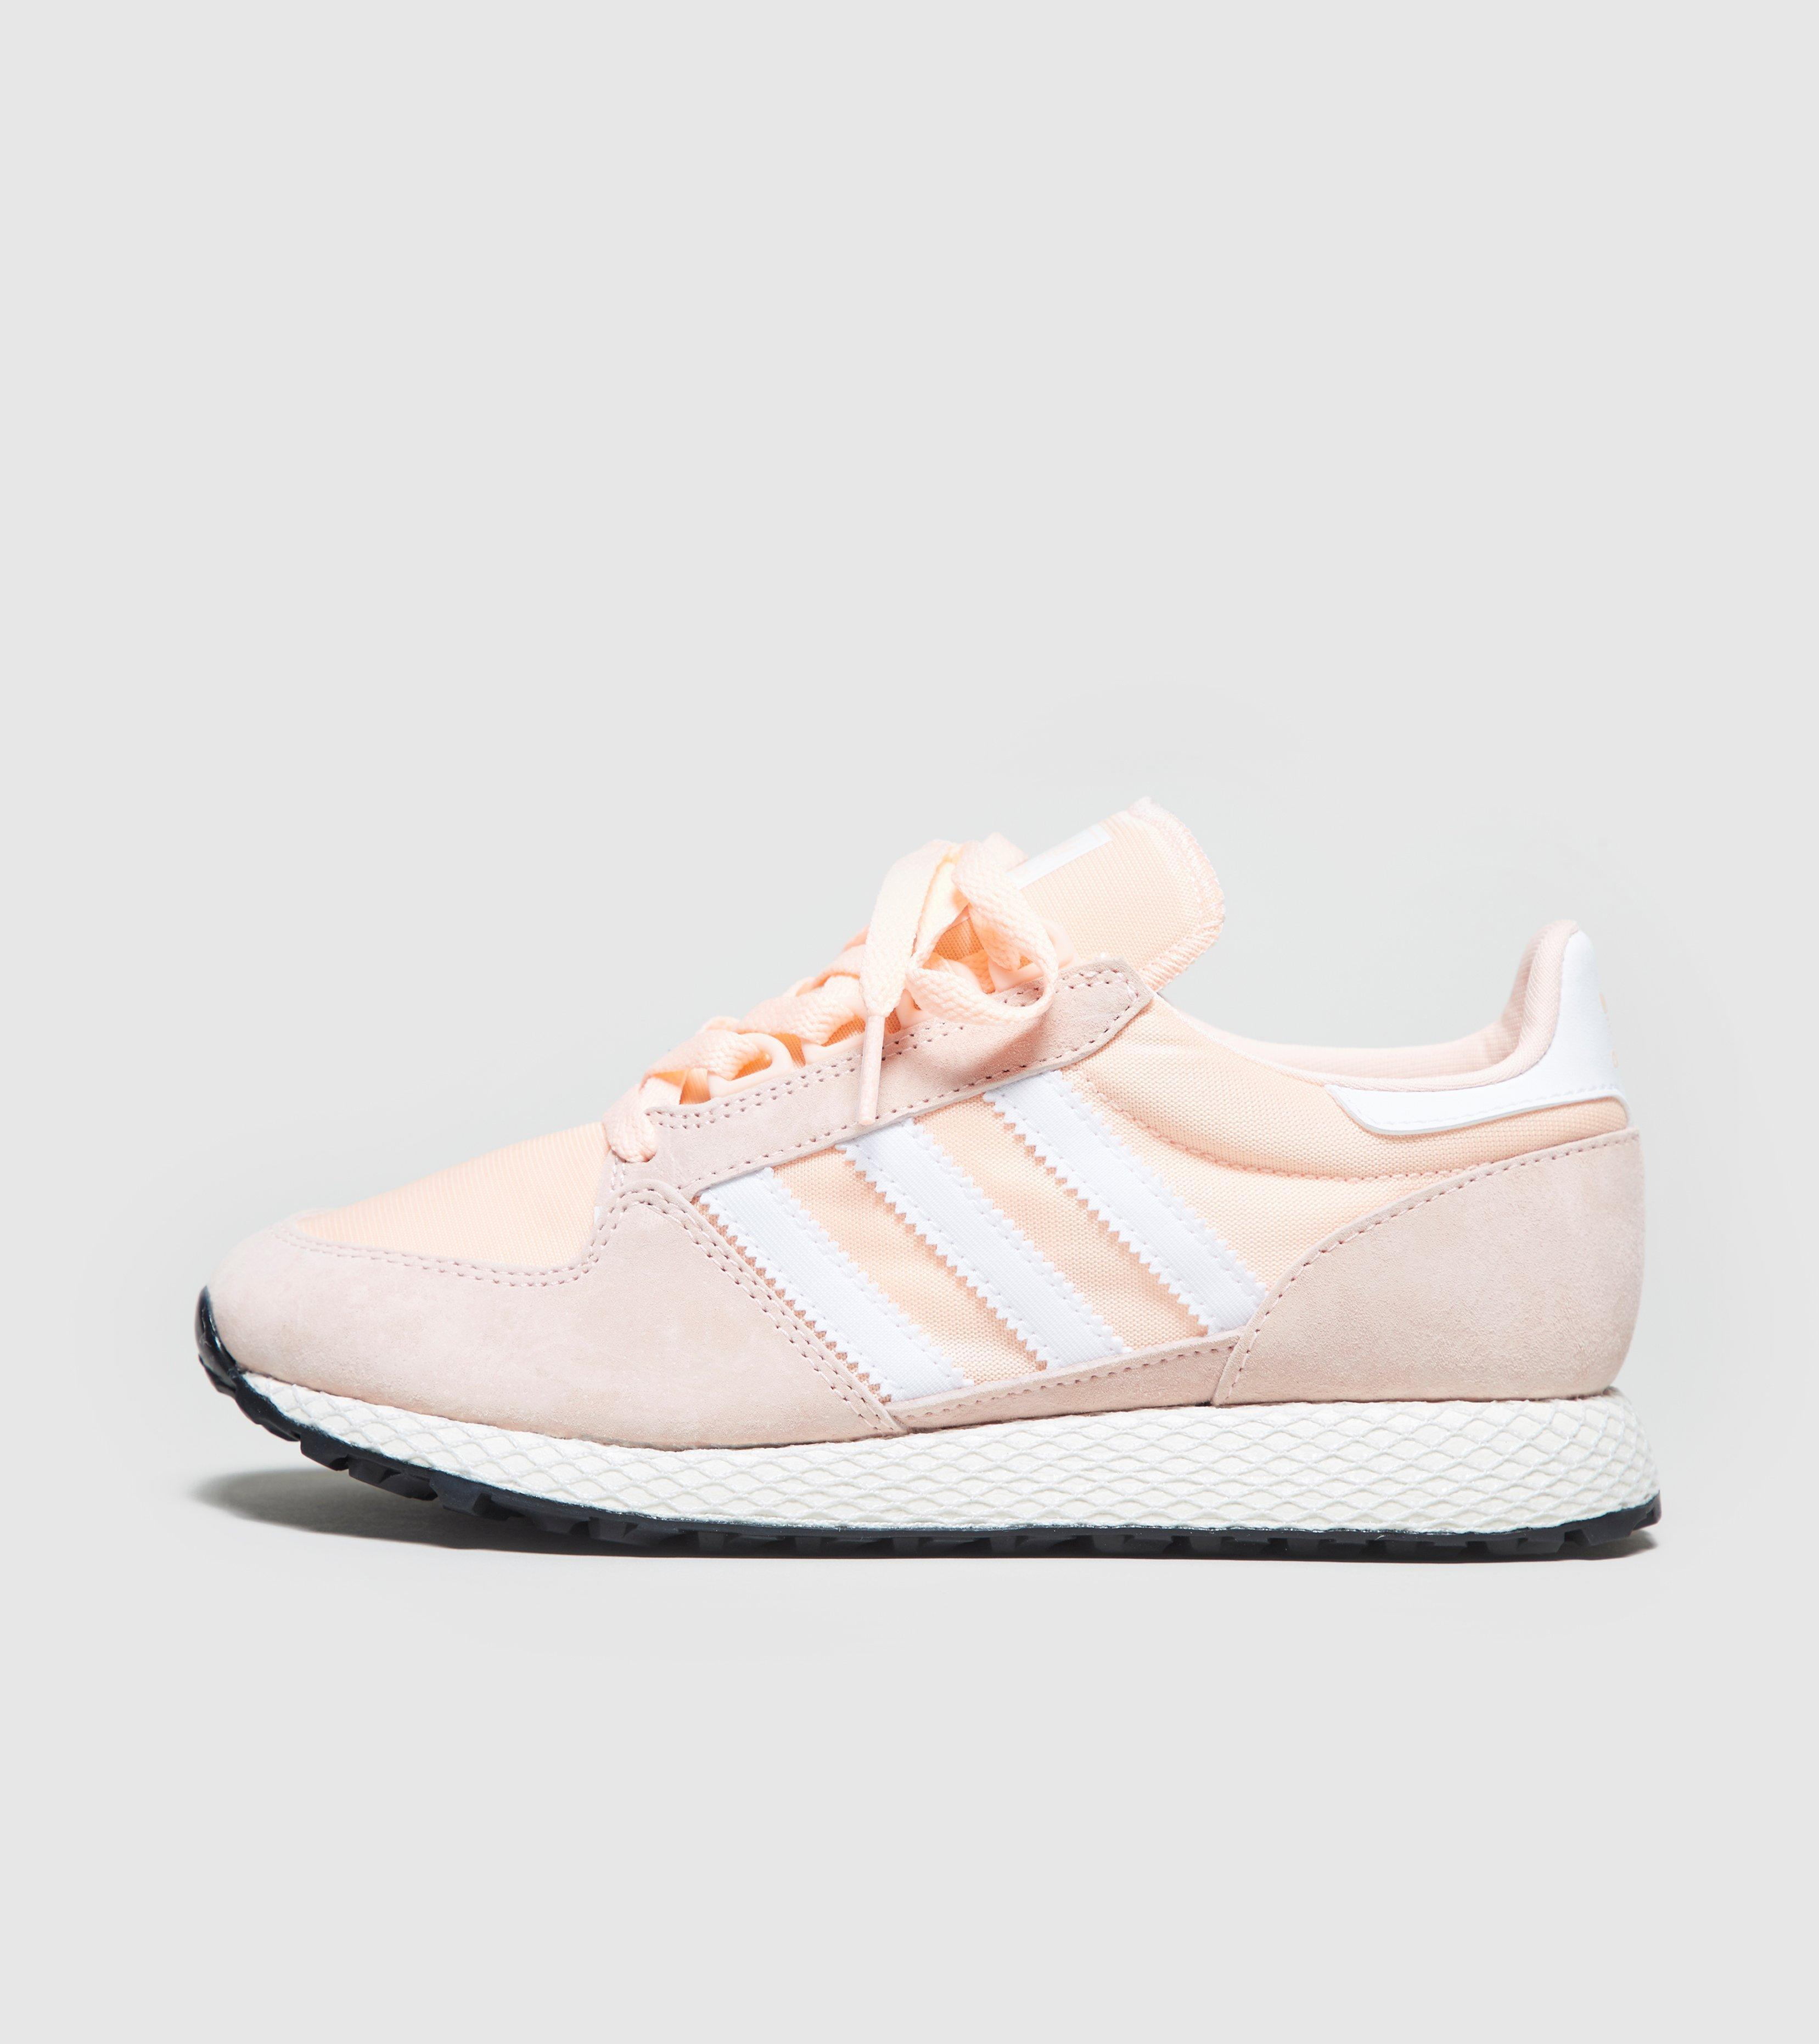 Mujeres Lyst Adidas Forest Grove en rosa salvar 2%